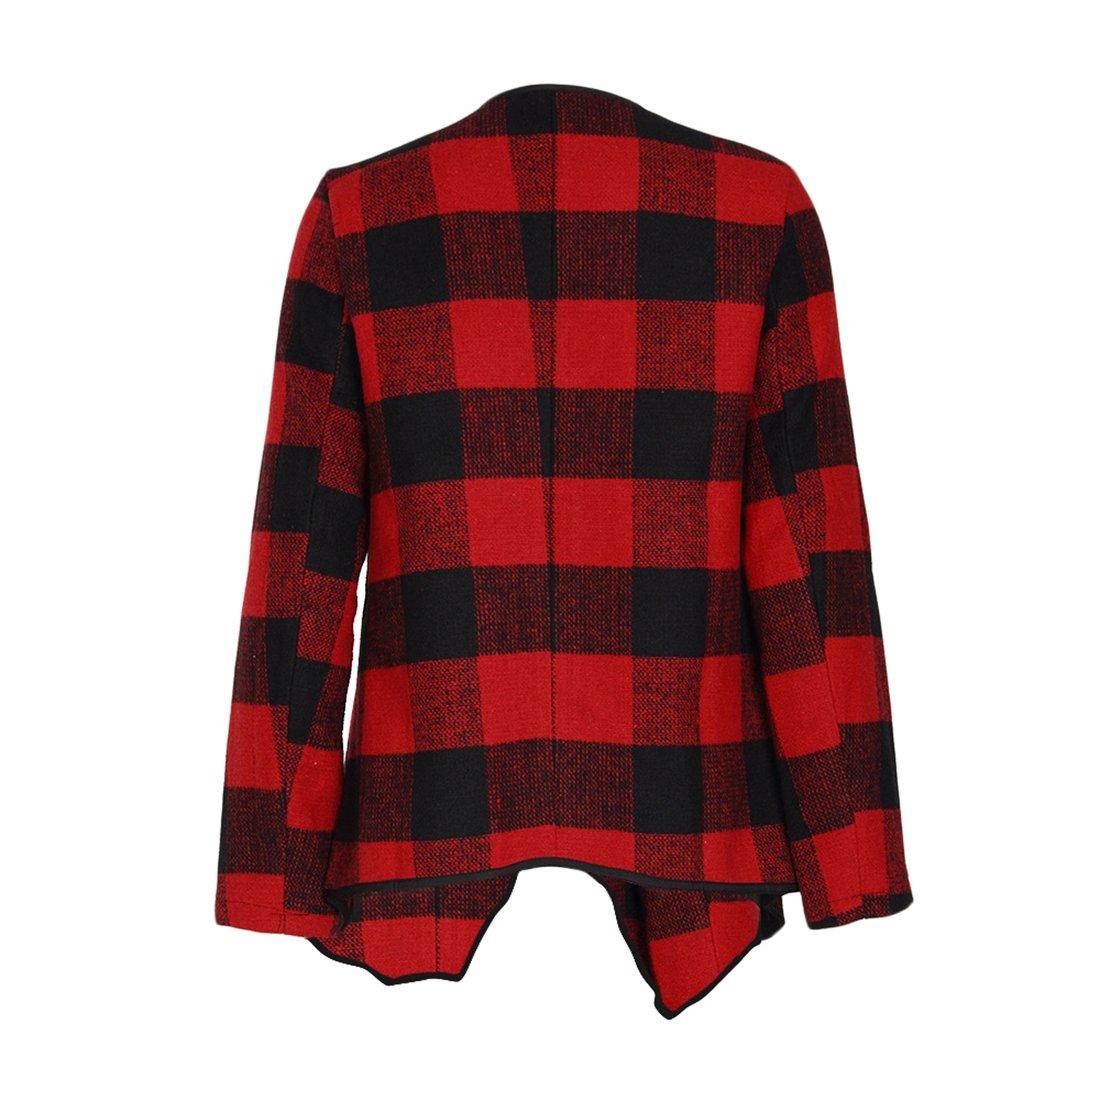 Shinekoo Women Cardigan Jacket Checked Plaid Open Front Coat Outwear by Shinekoo (Image #5)